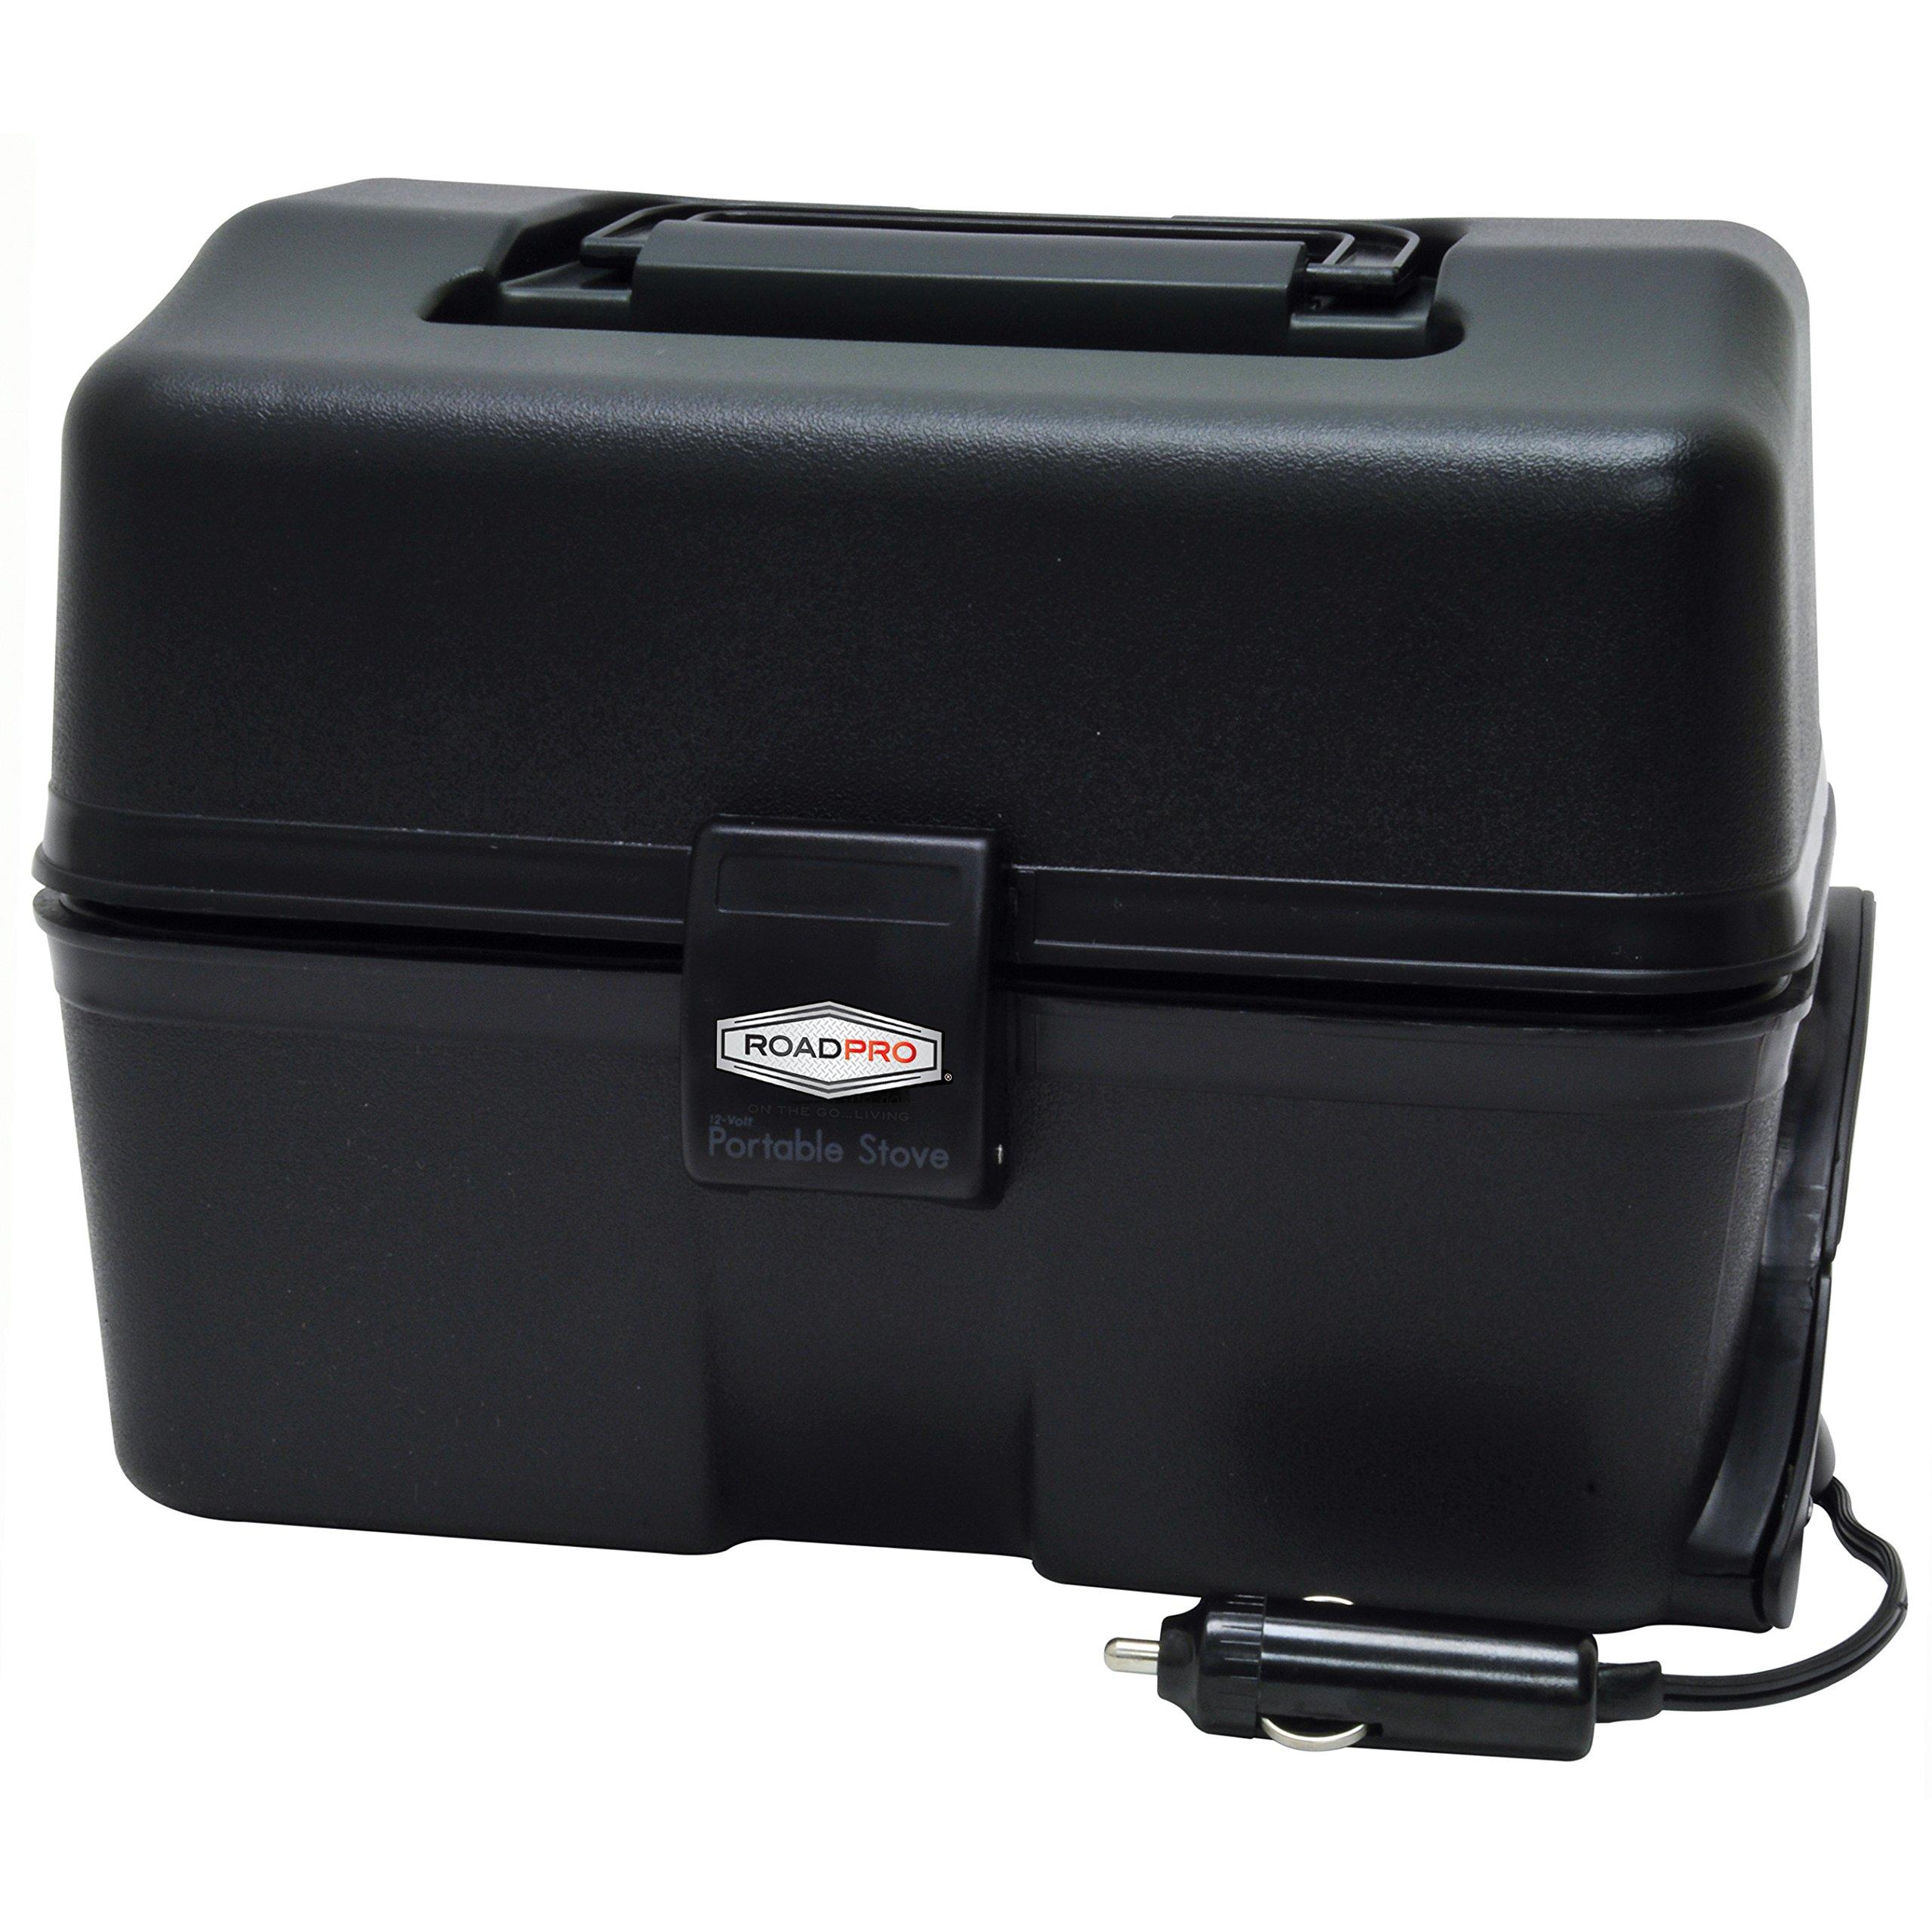 RoadPro 12-Volt Portable Stove, Black by RoadPro